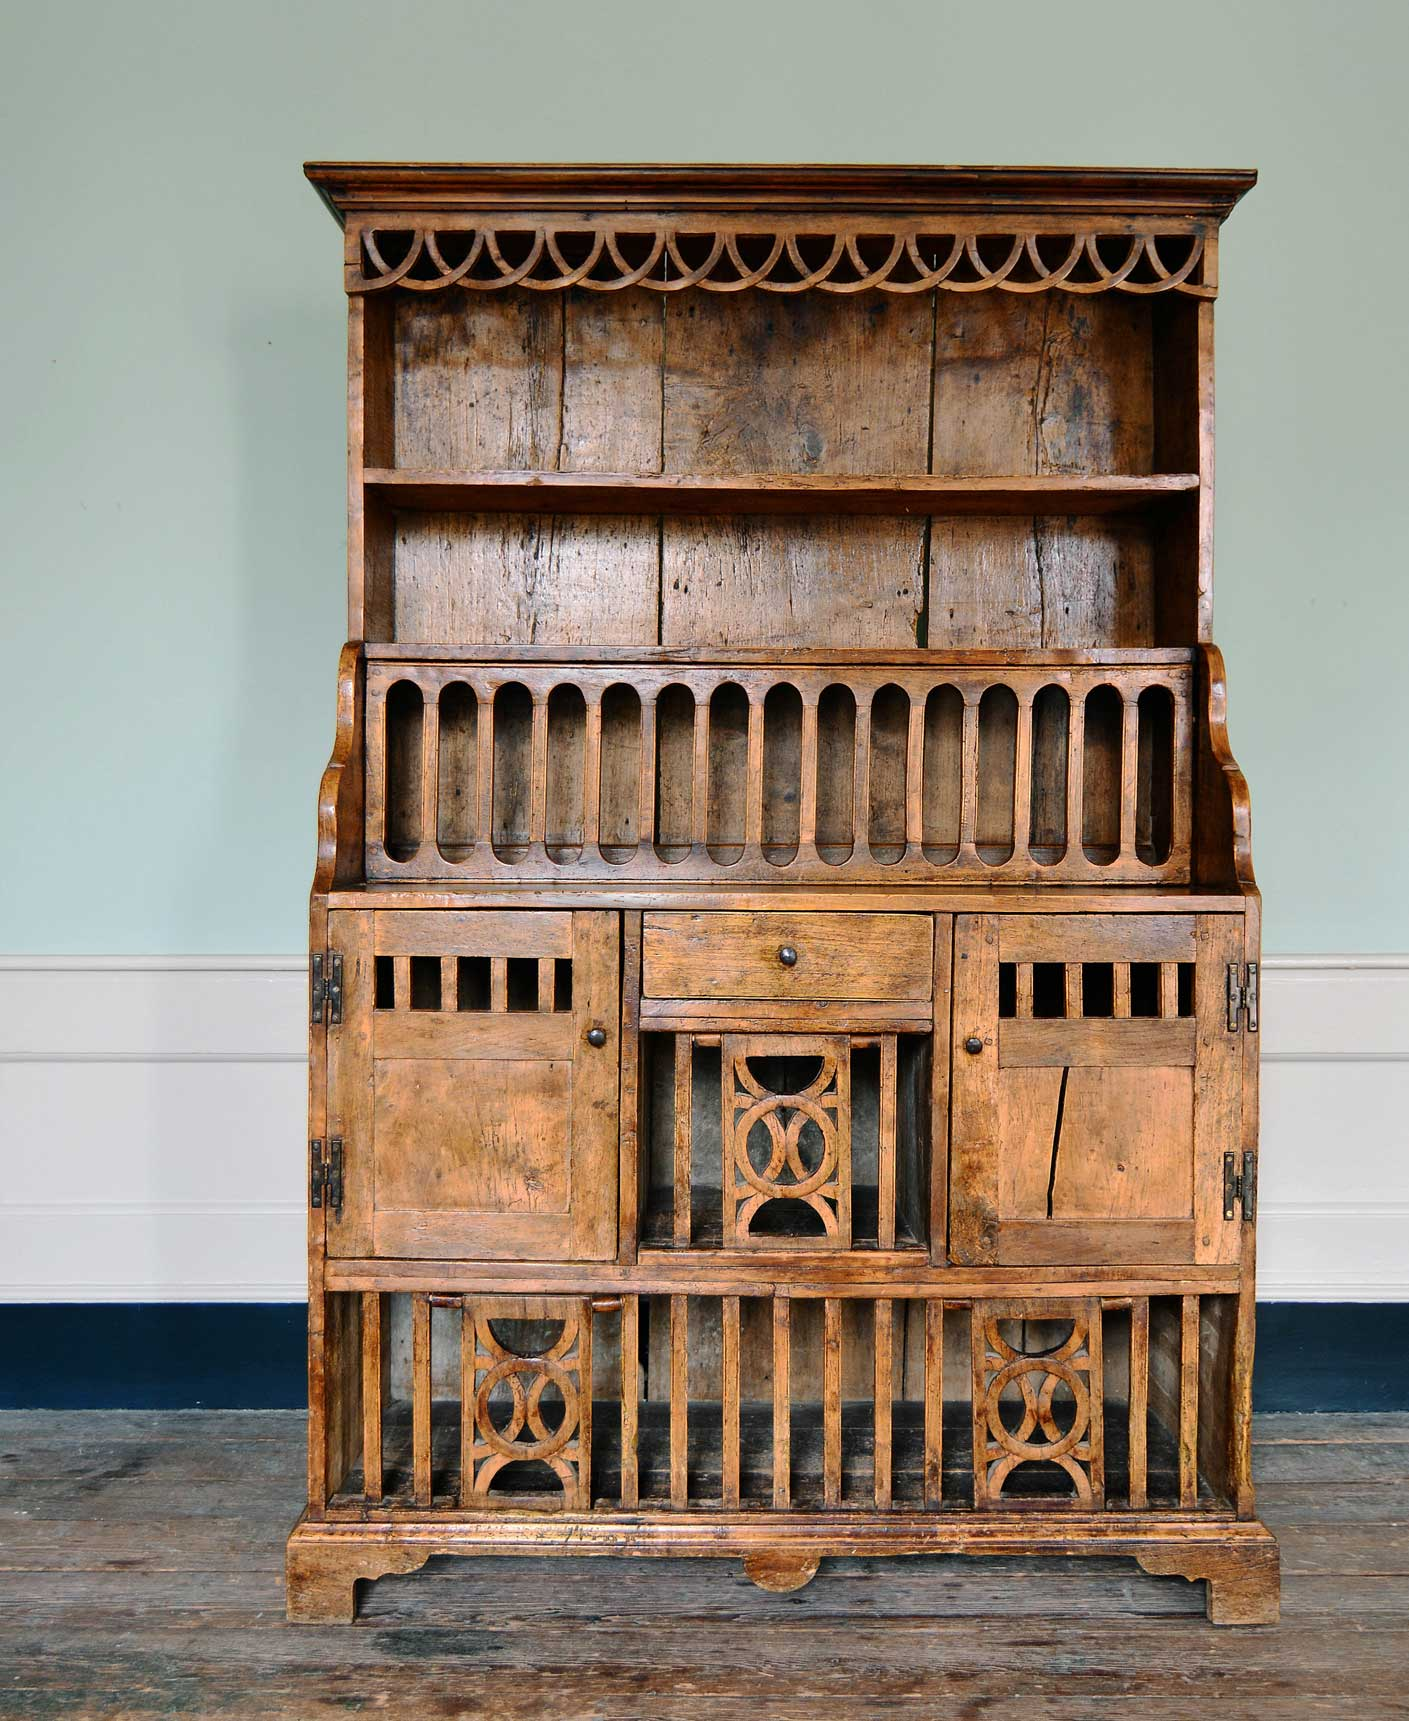 Vintage dresser from Lassco. Vintage furniture is invariably well made. www.lassco.co.uk